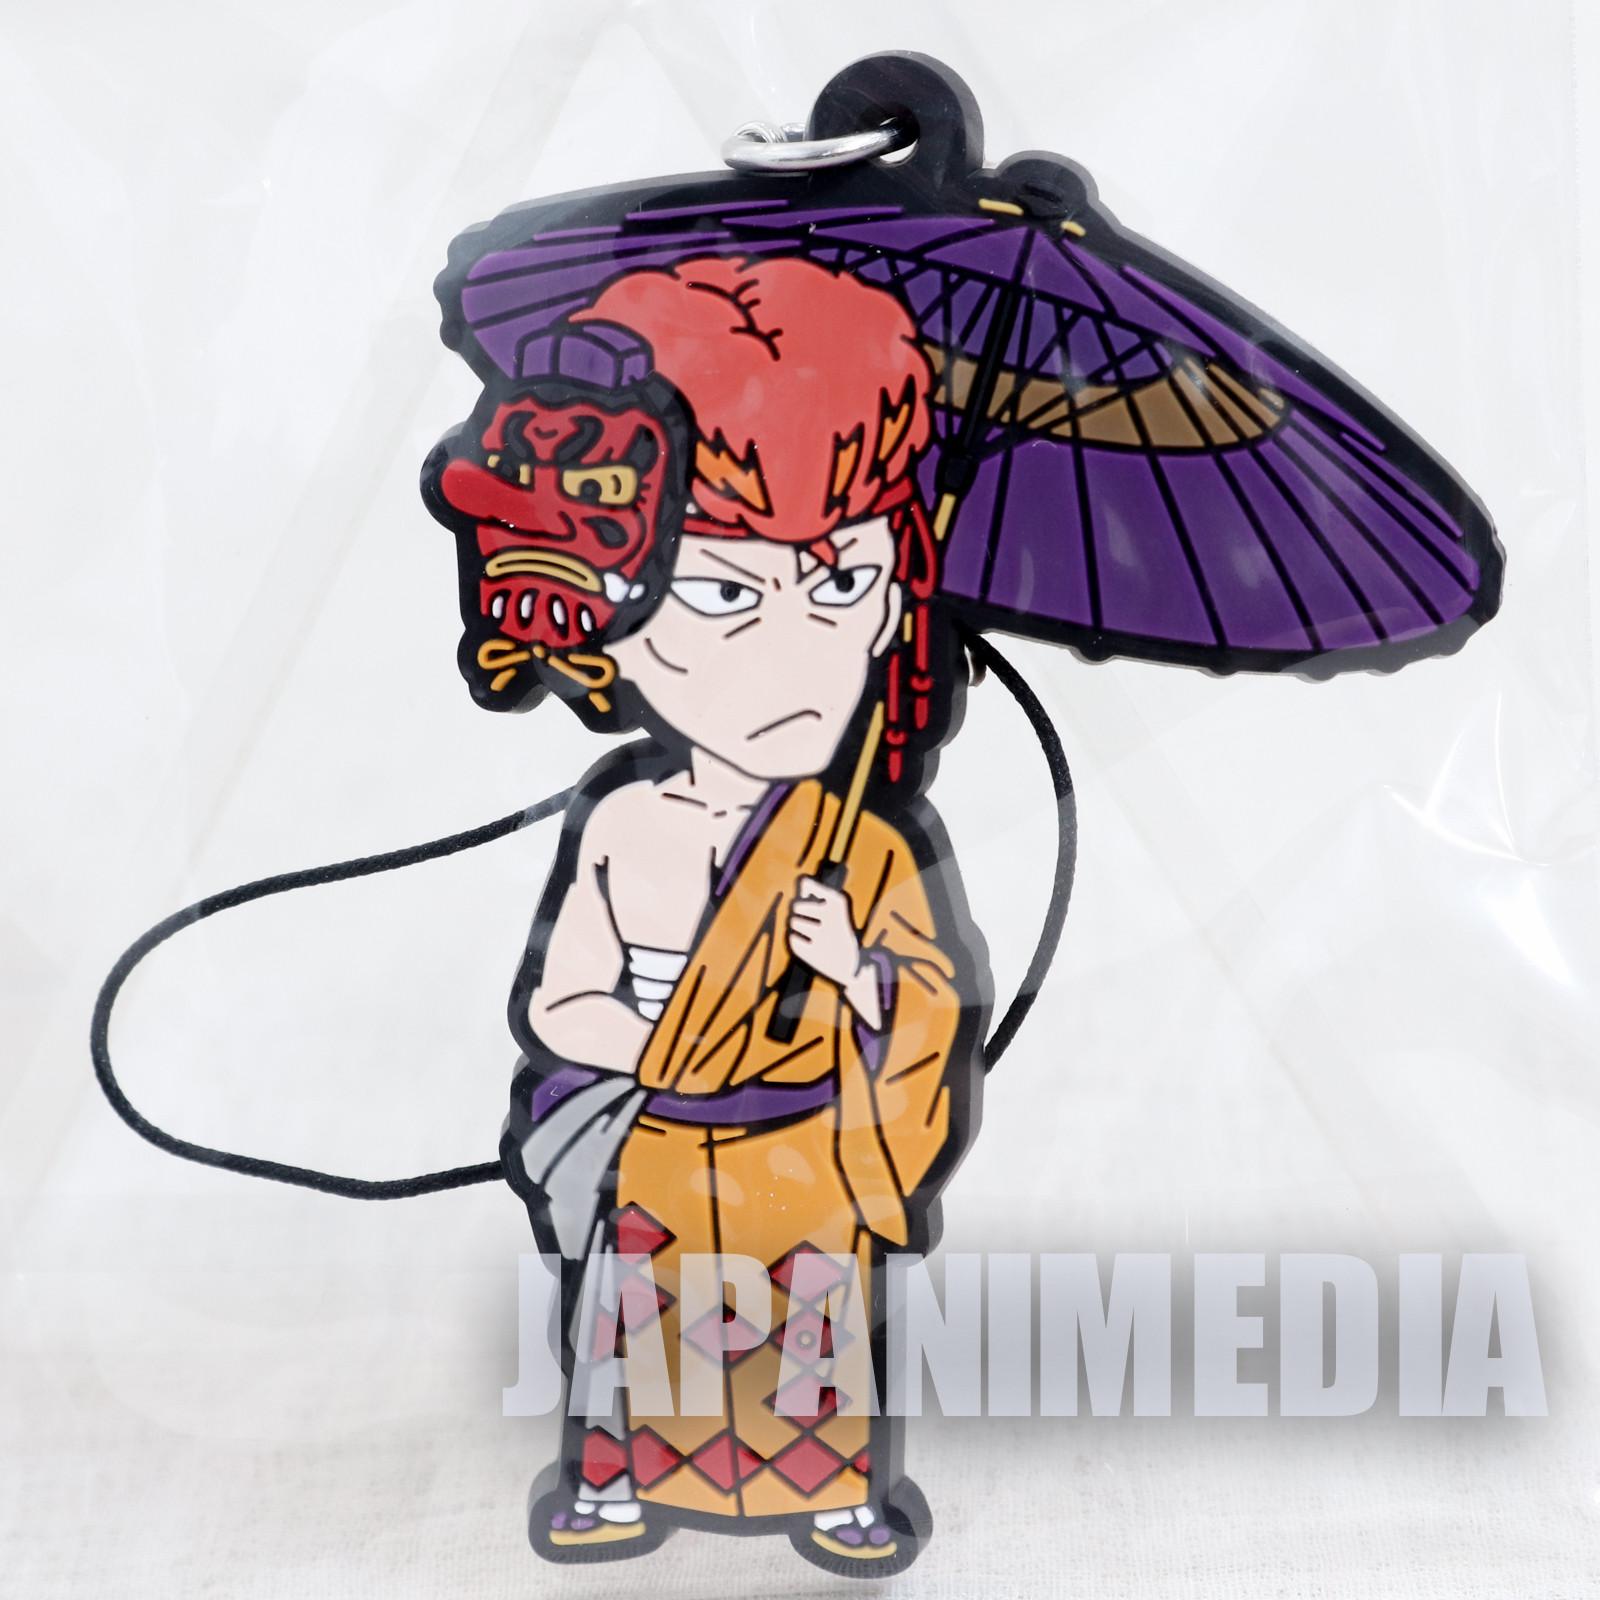 Yu-Yu Hakusho Kazuma Kuwabara Fortune Rubber Mascot Strap JAPAN ANIME MANGA